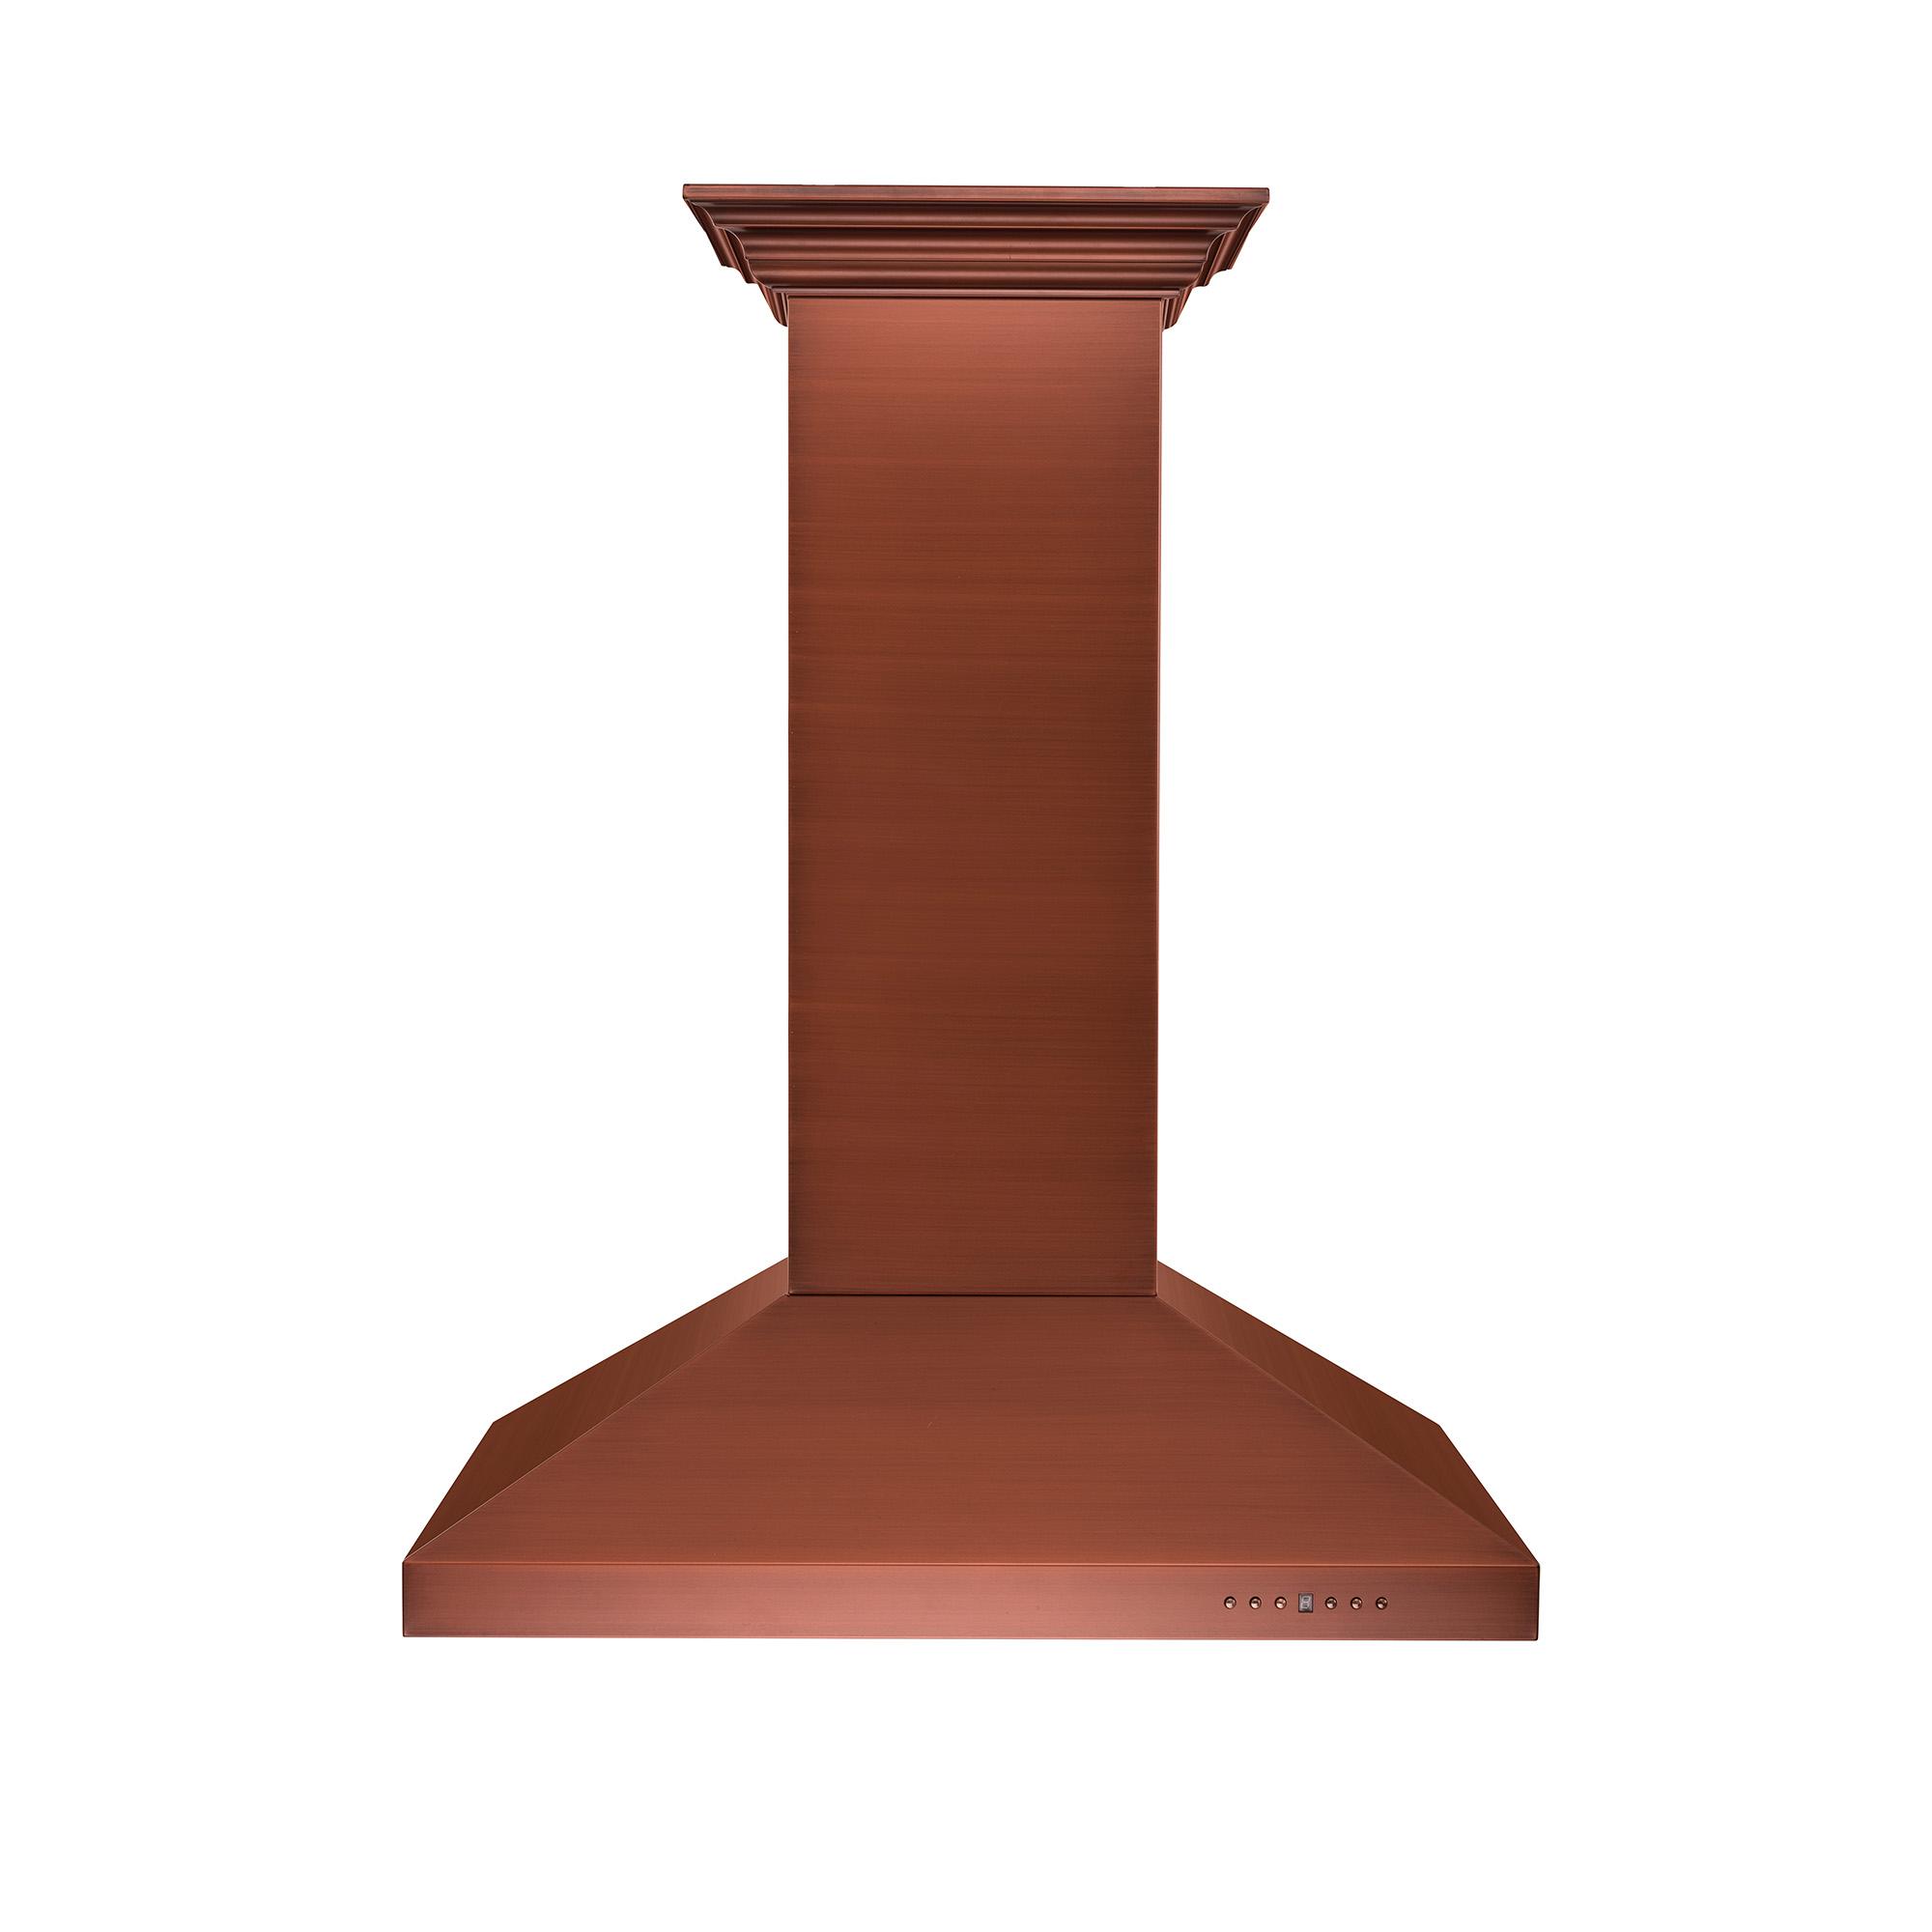 zline-copper-island-mounted-range-hood-8kl3ic-front-2.jpg